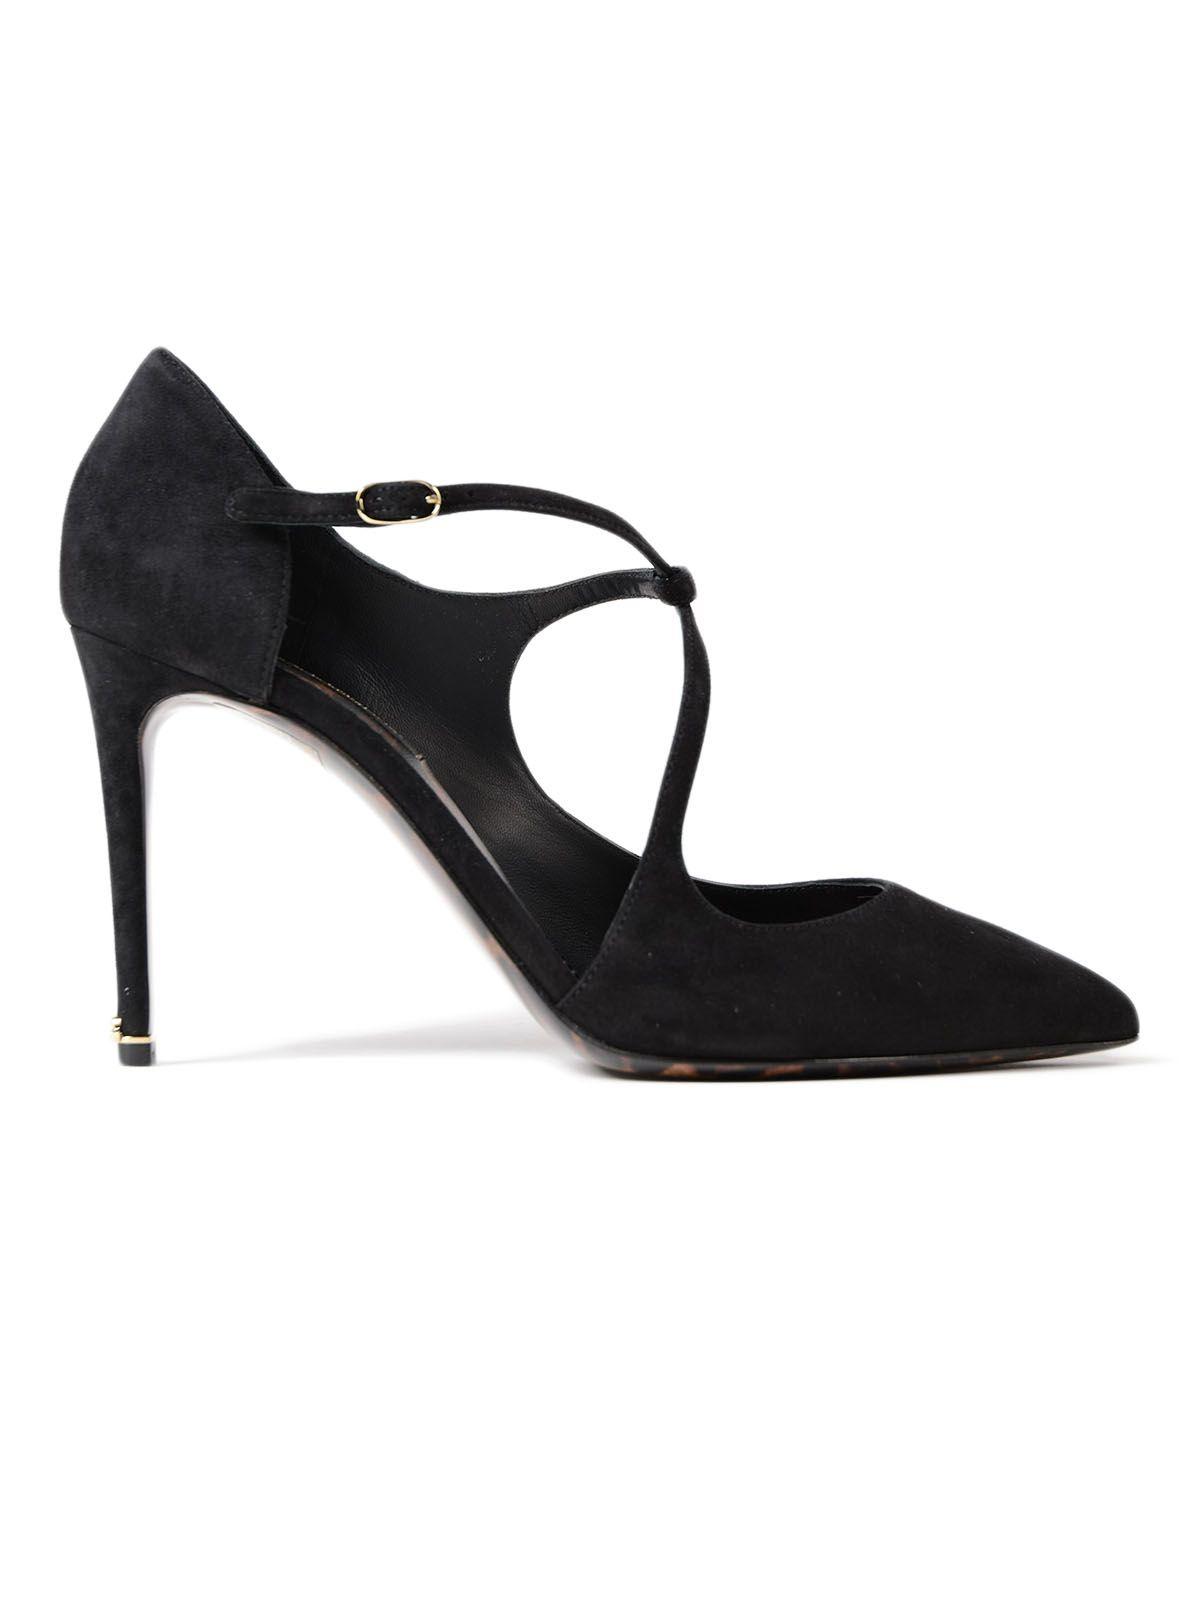 Dolce & Gabbana Mary Jane Suede